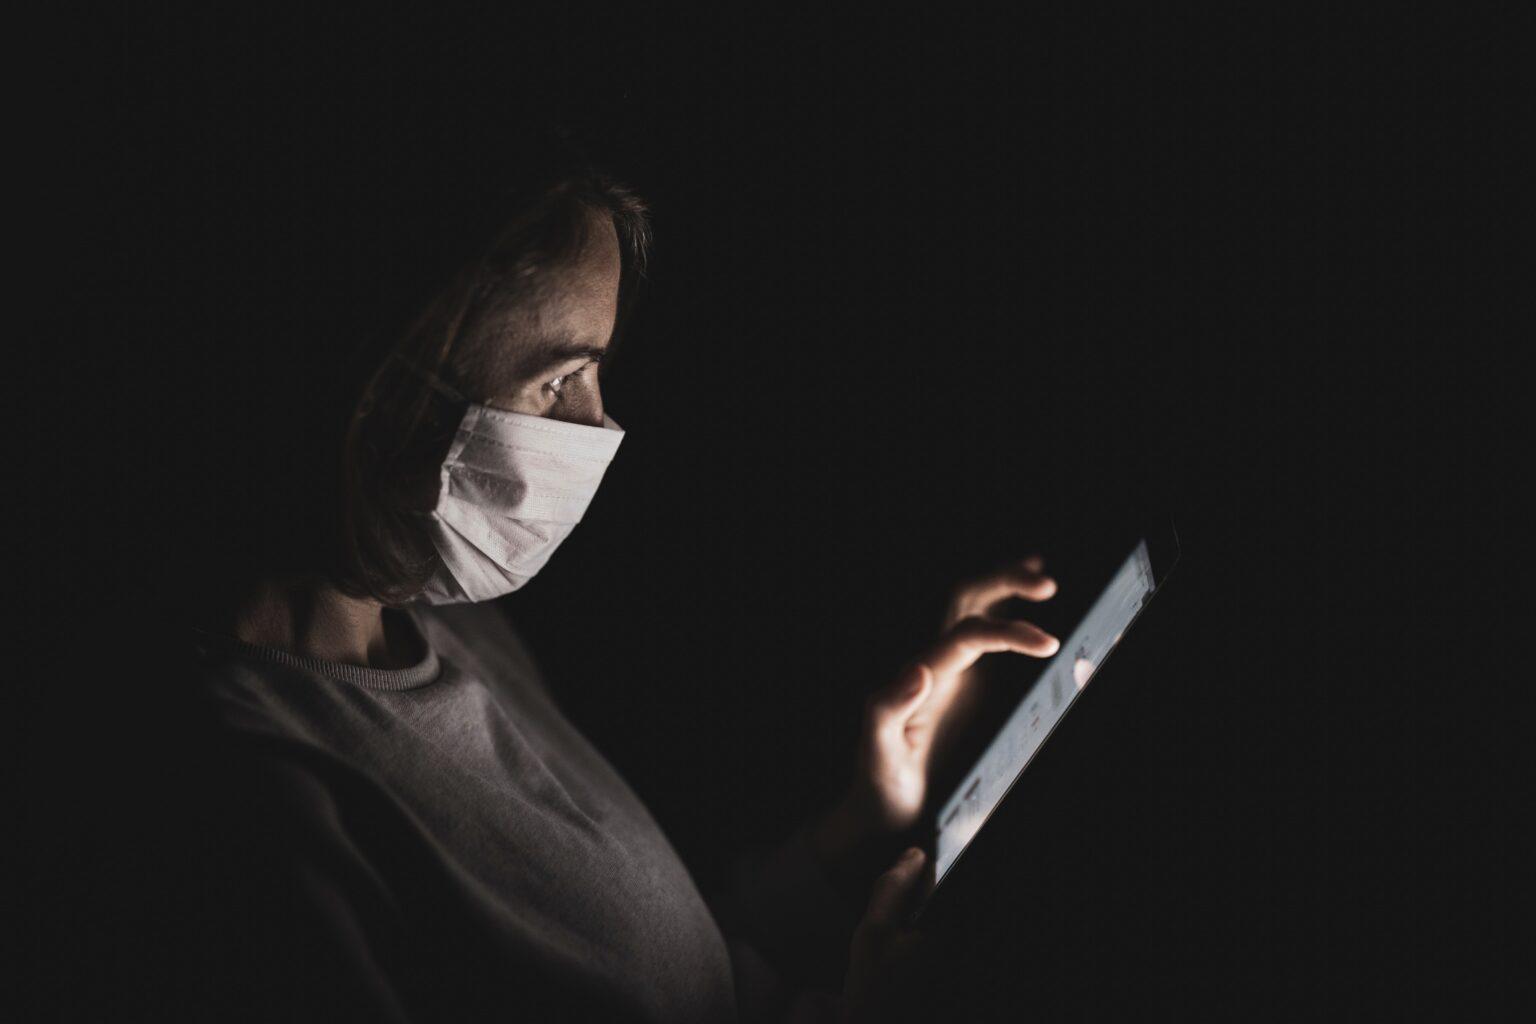 Mask download